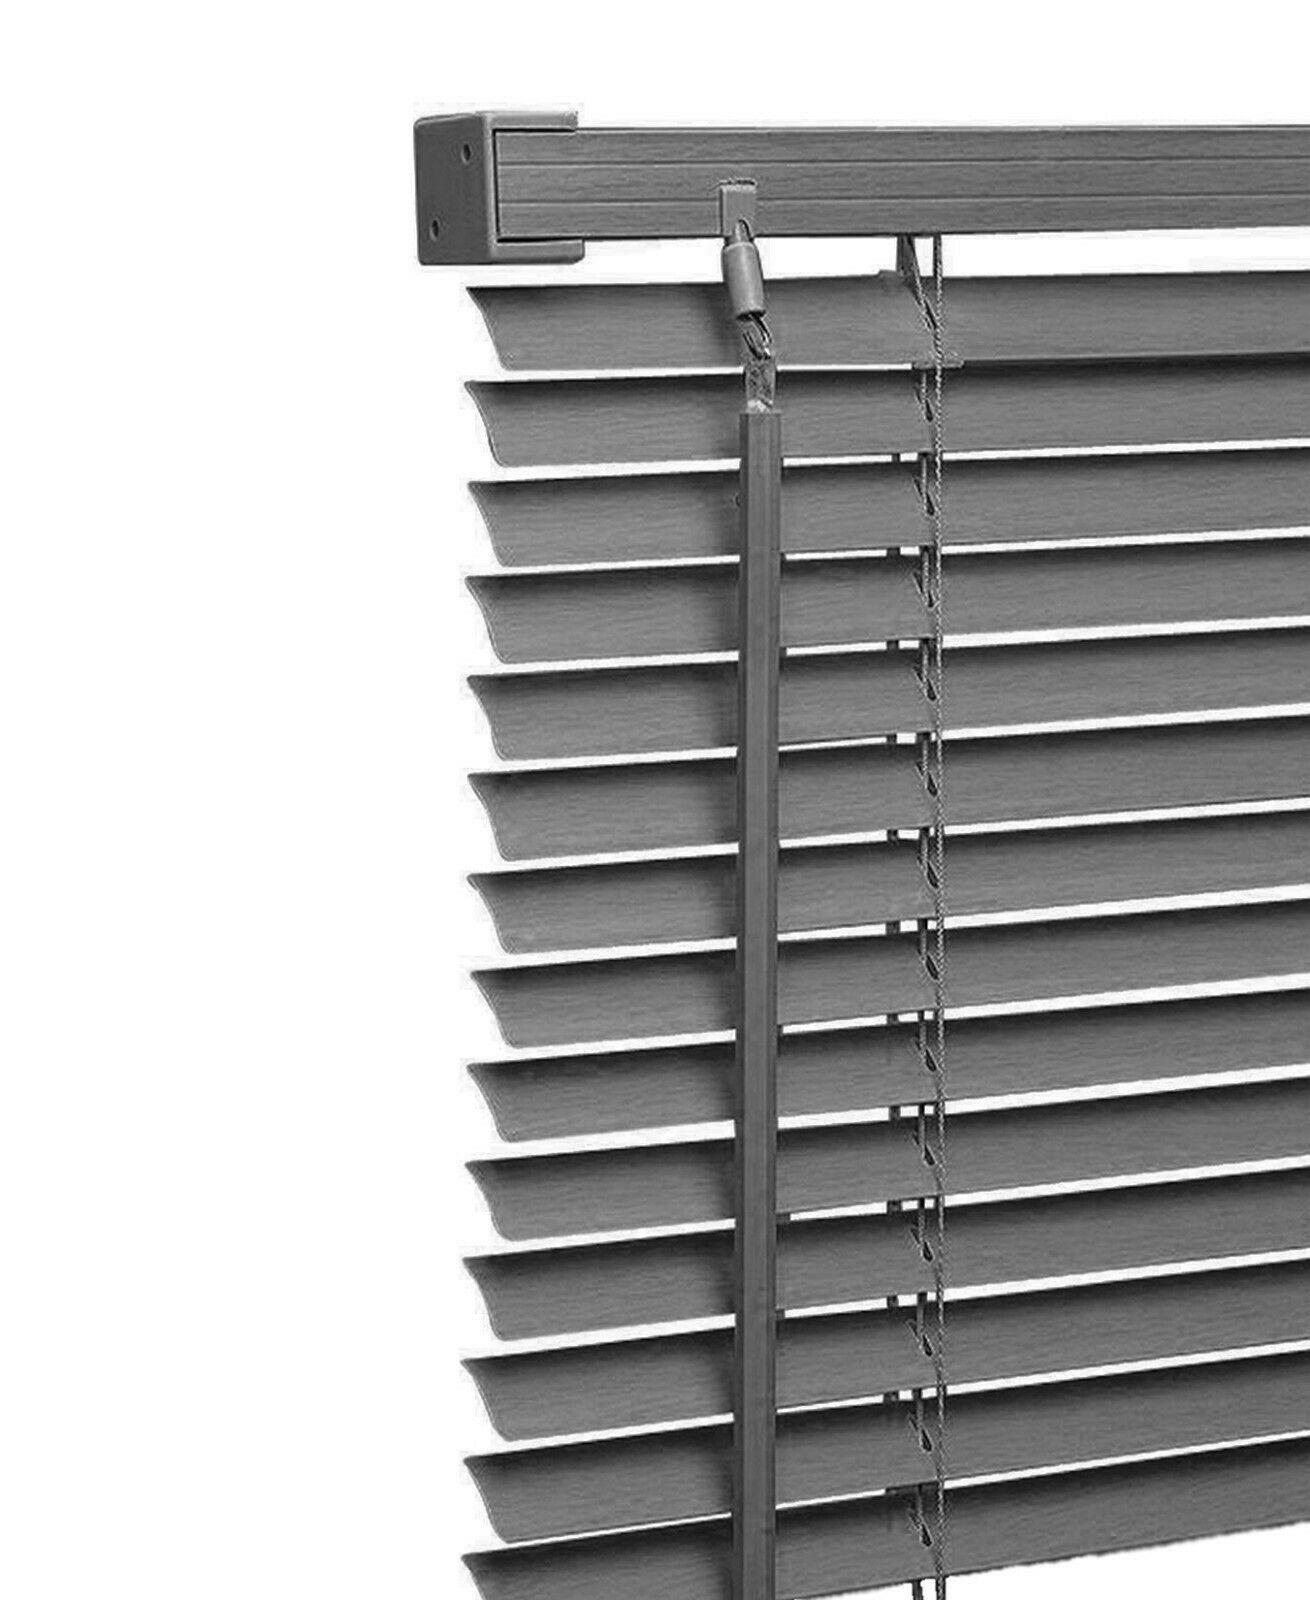 New Pvc Blinds Window Venetian White Easy Fit Home Office Blind Wood Effect All Sizes Pvc Blinds Blinds Blinds For Windows